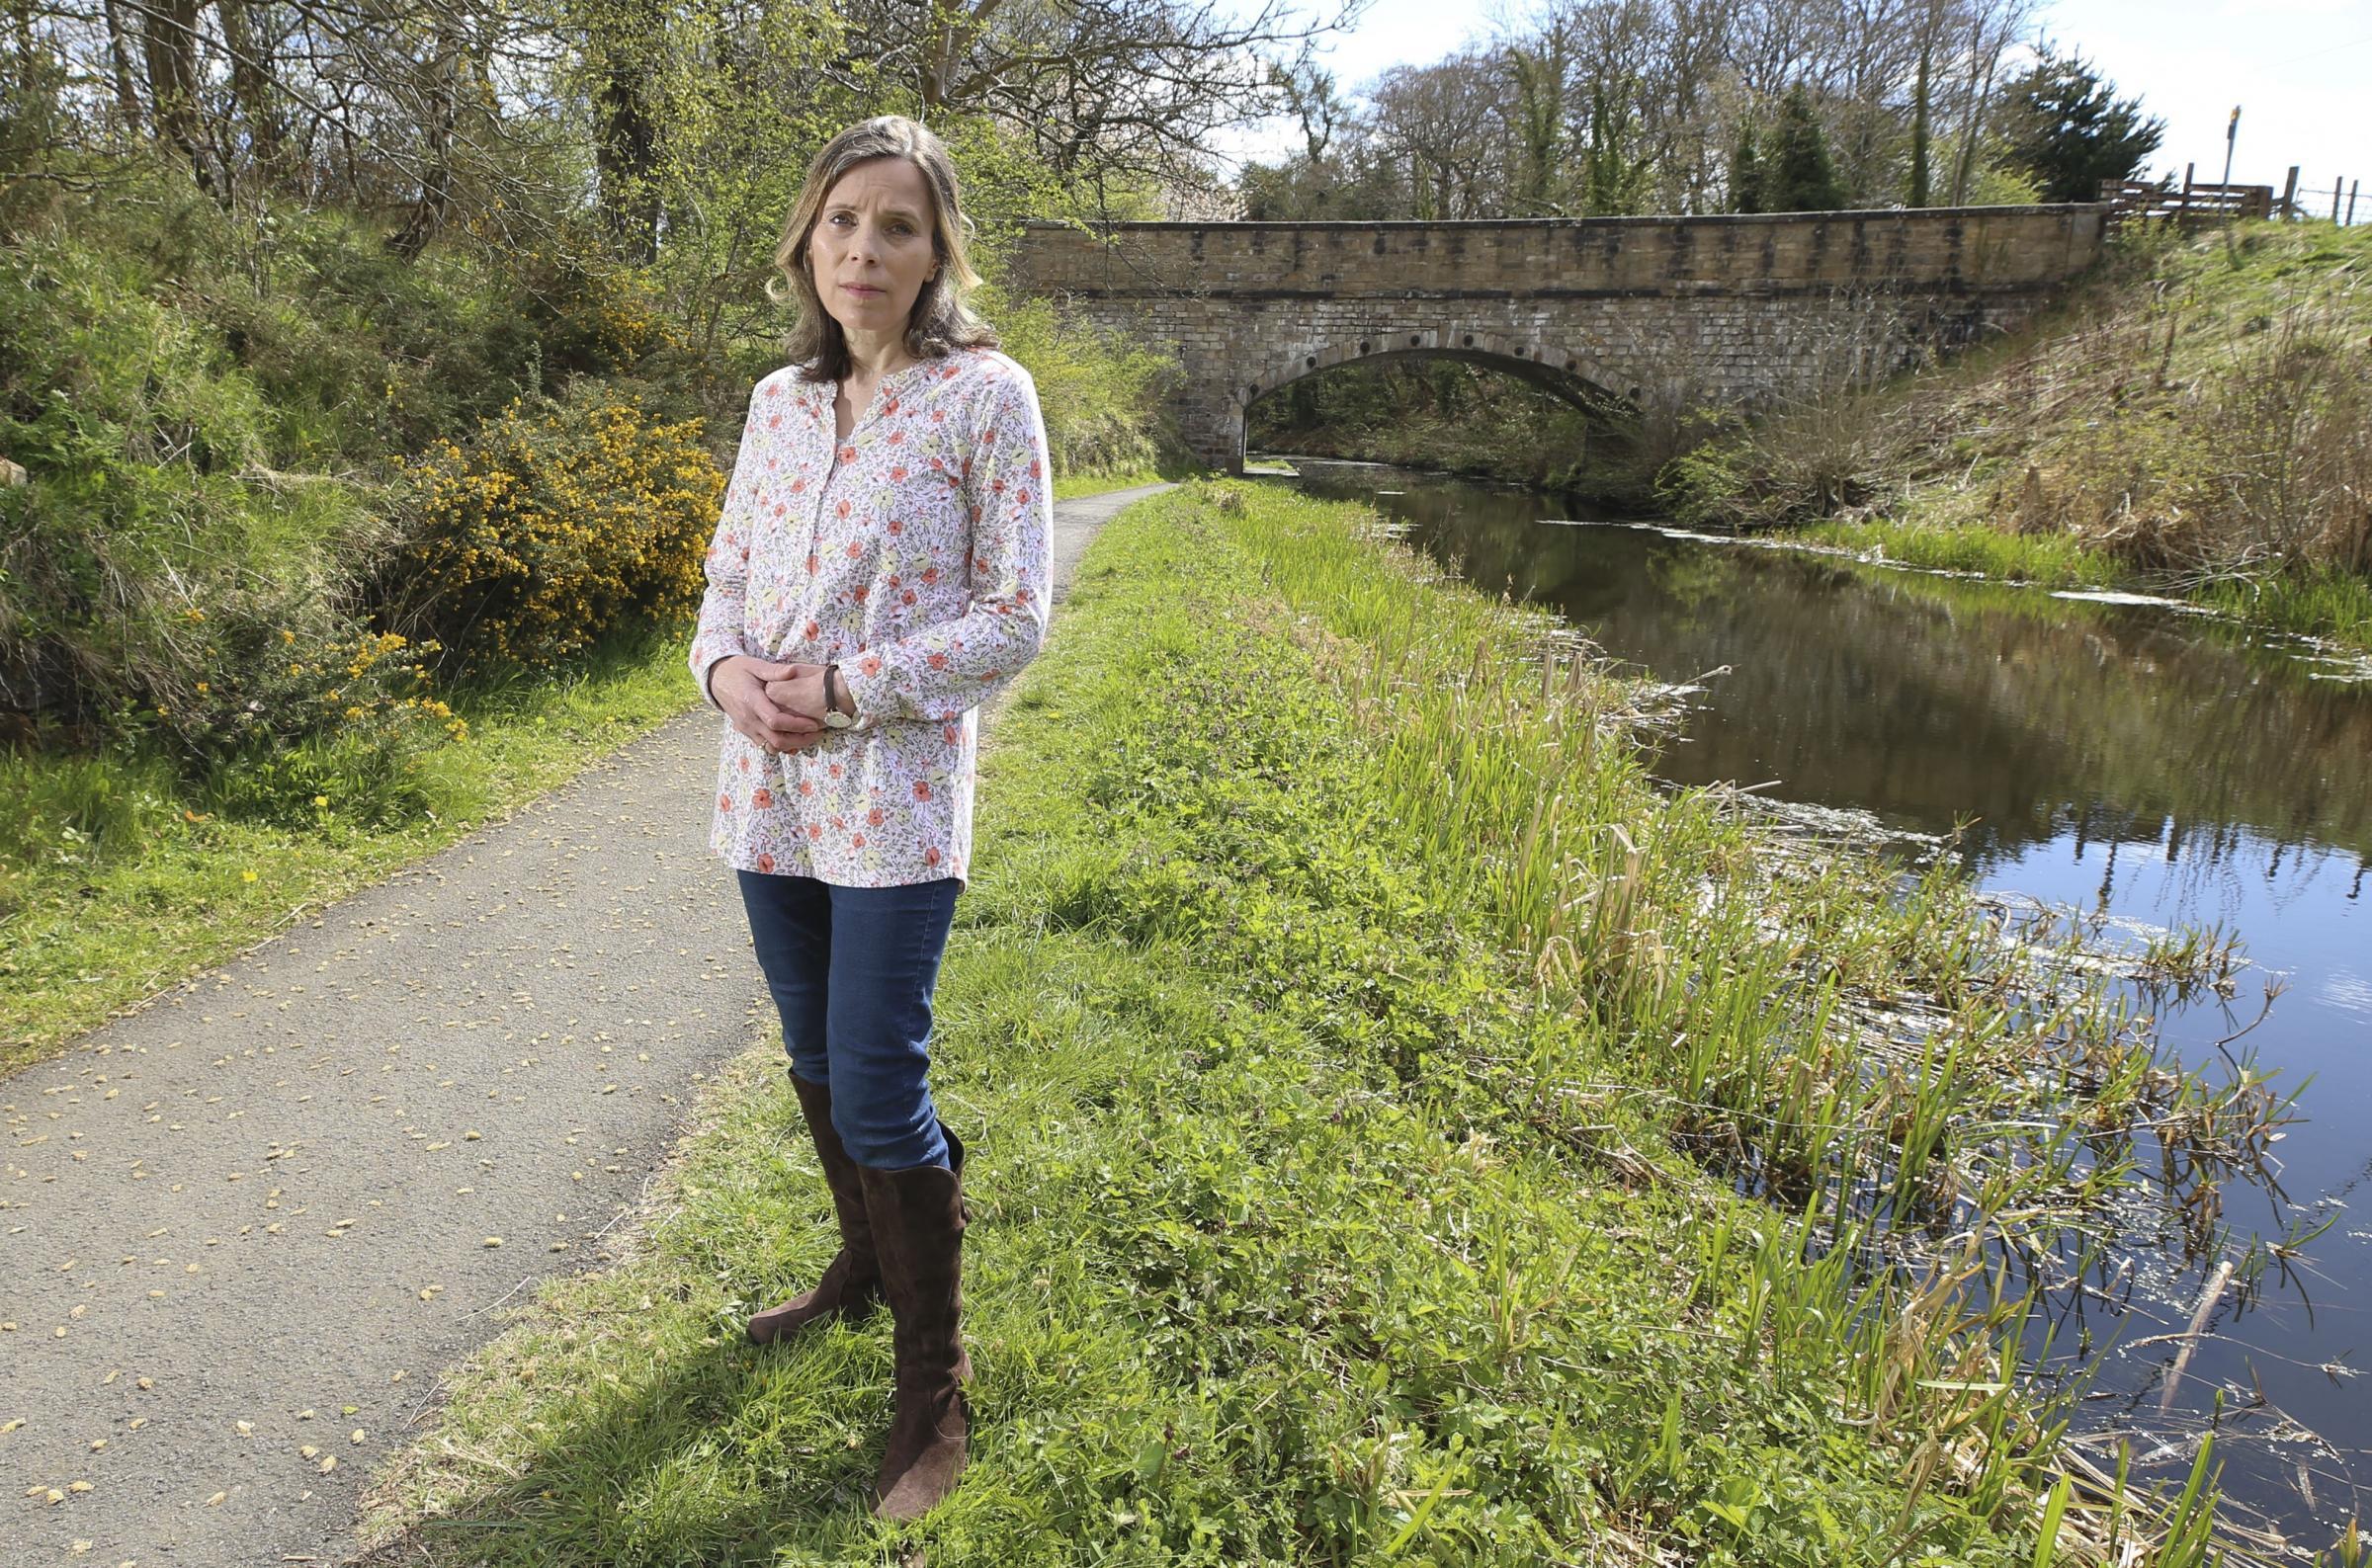 Glasgow crime: The terrorist plot that almost blew up Possil aqueduct